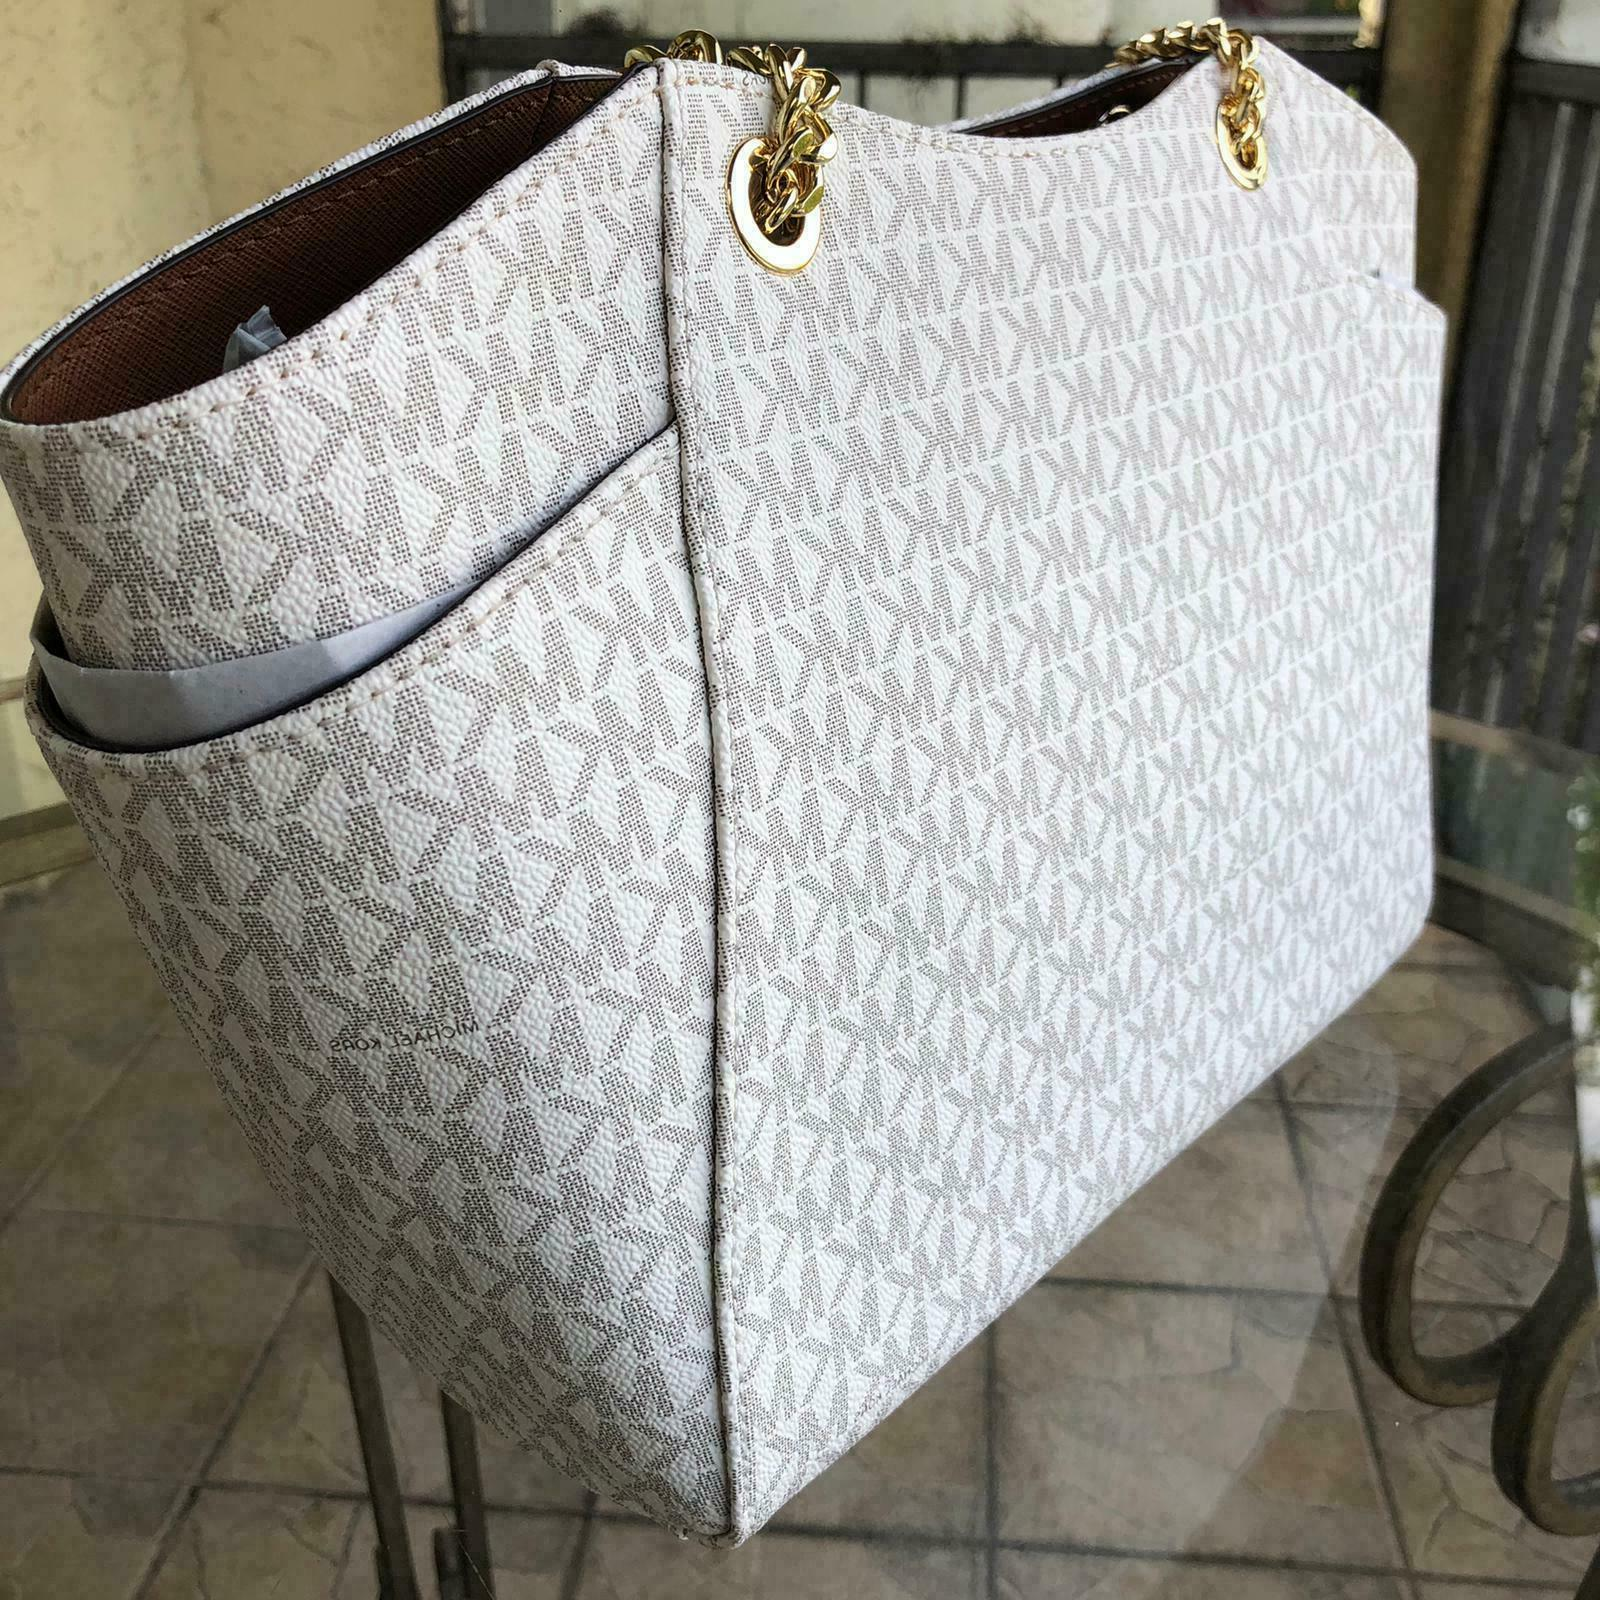 Michael Kors Women Shoulder Tote Handbag Messenger MK